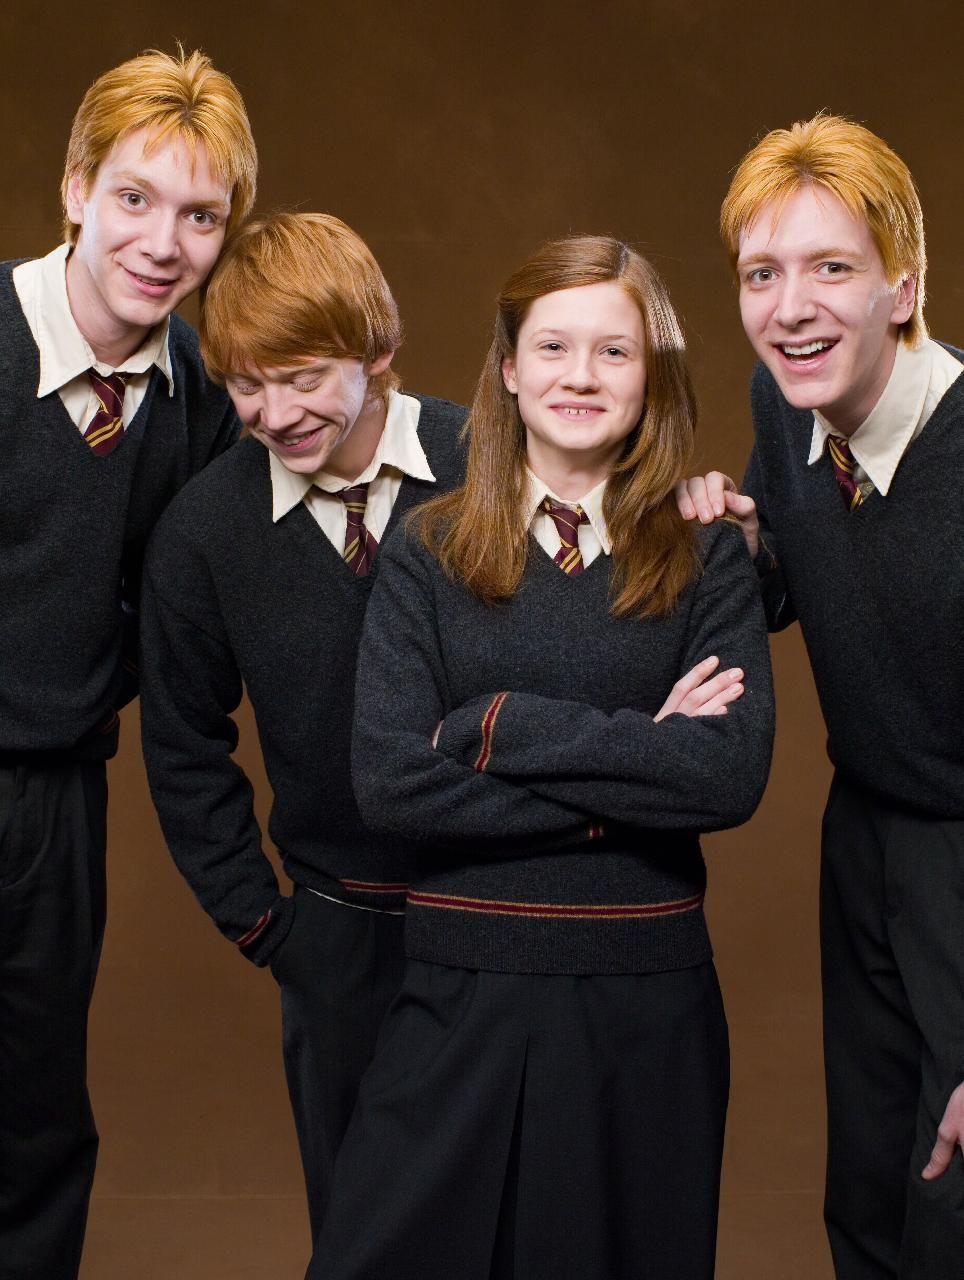 Download Weasleys Wallpaper By Mrs Lupin 8d Free On Zedge Now Browse Millions Of Popular Bonnie Wallpaper Harry Potter Cast Harry Potter Filmleri Unluler